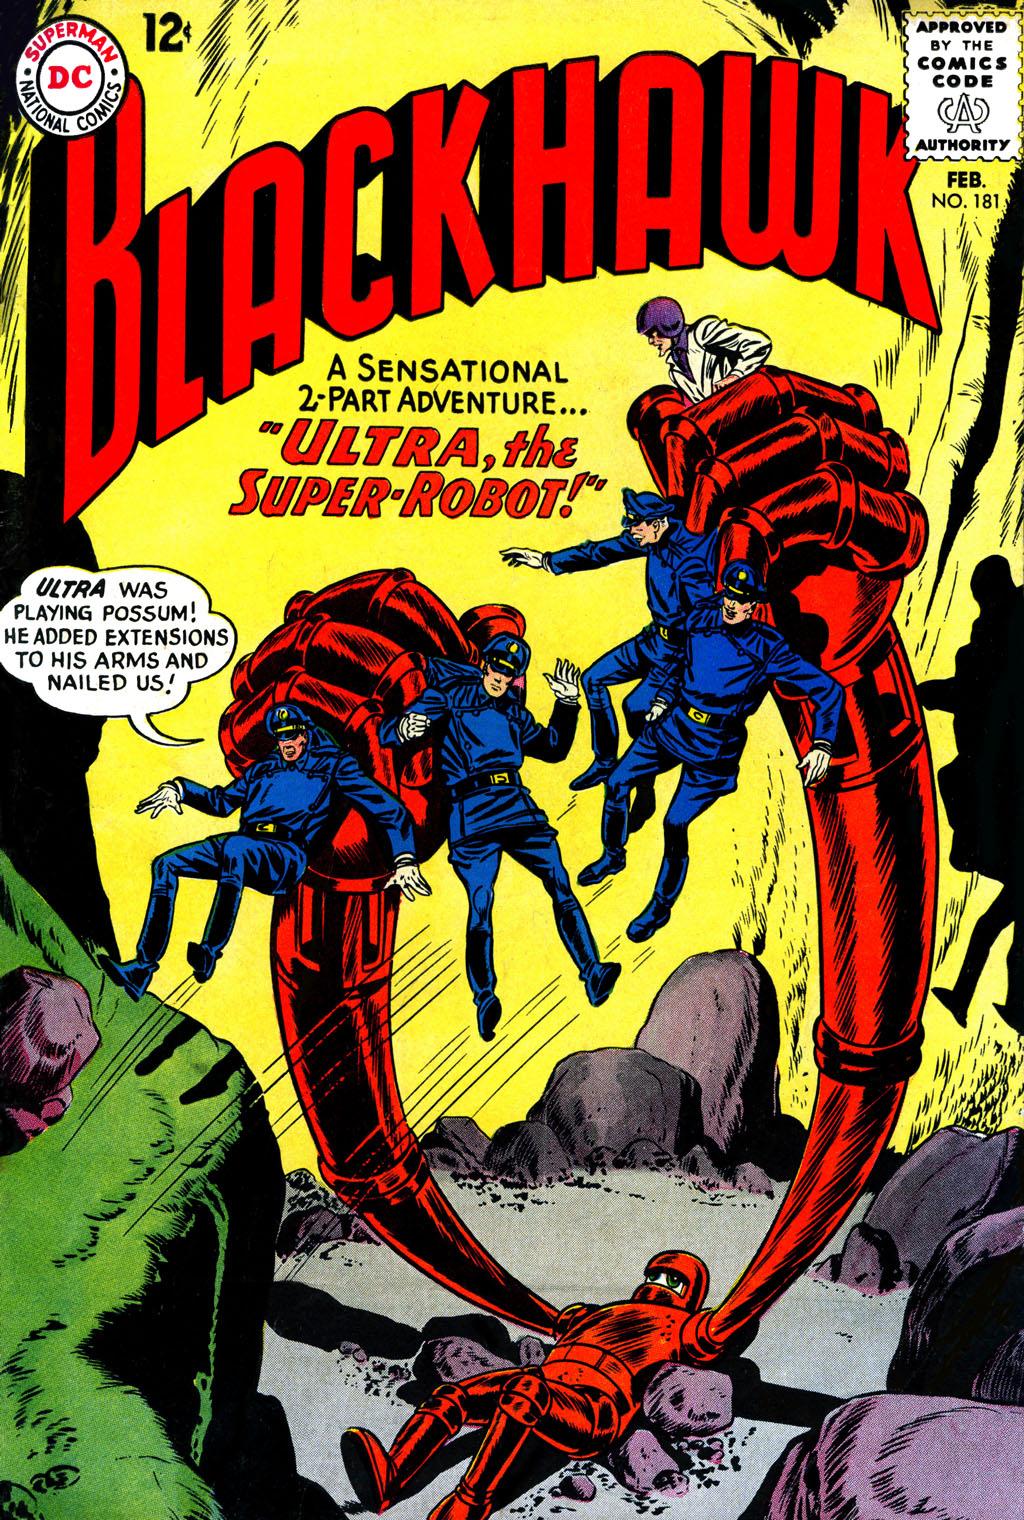 Blackhawk (1957) 181 Page 1